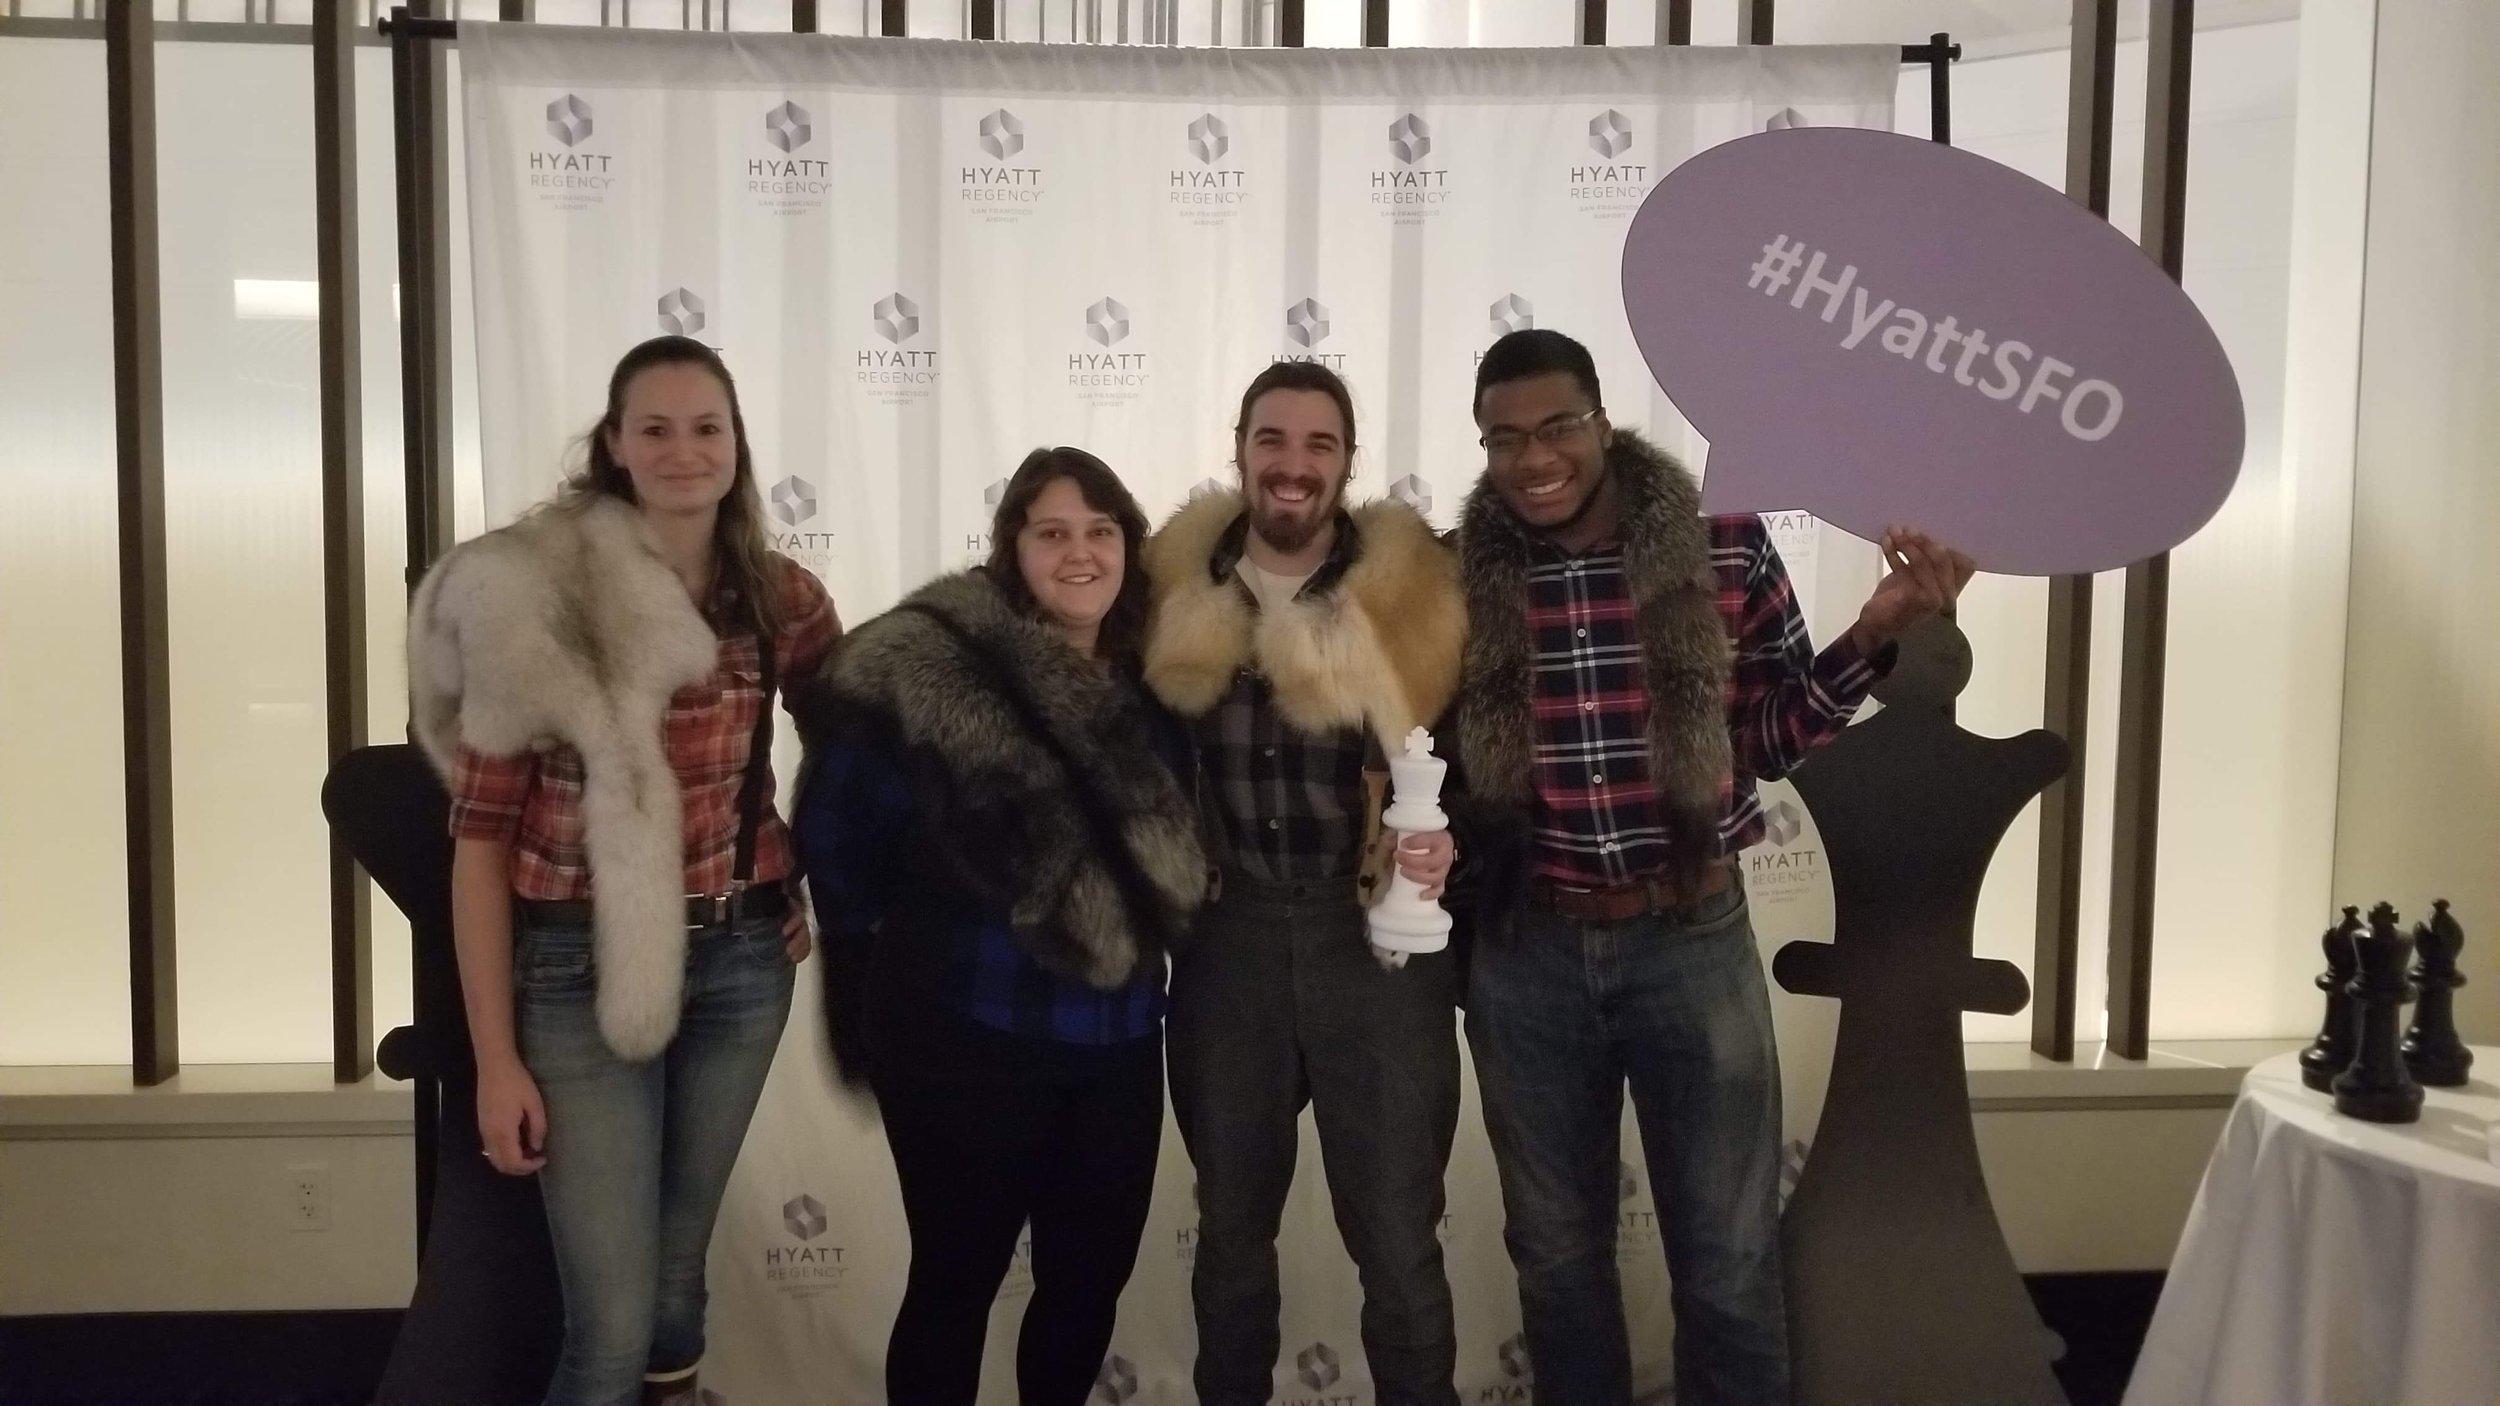 Left to right: Kayley McGruder, Emily Smith, Jonathon Singler, Emmanuel Perry     PC: Alaska Pacific Chess